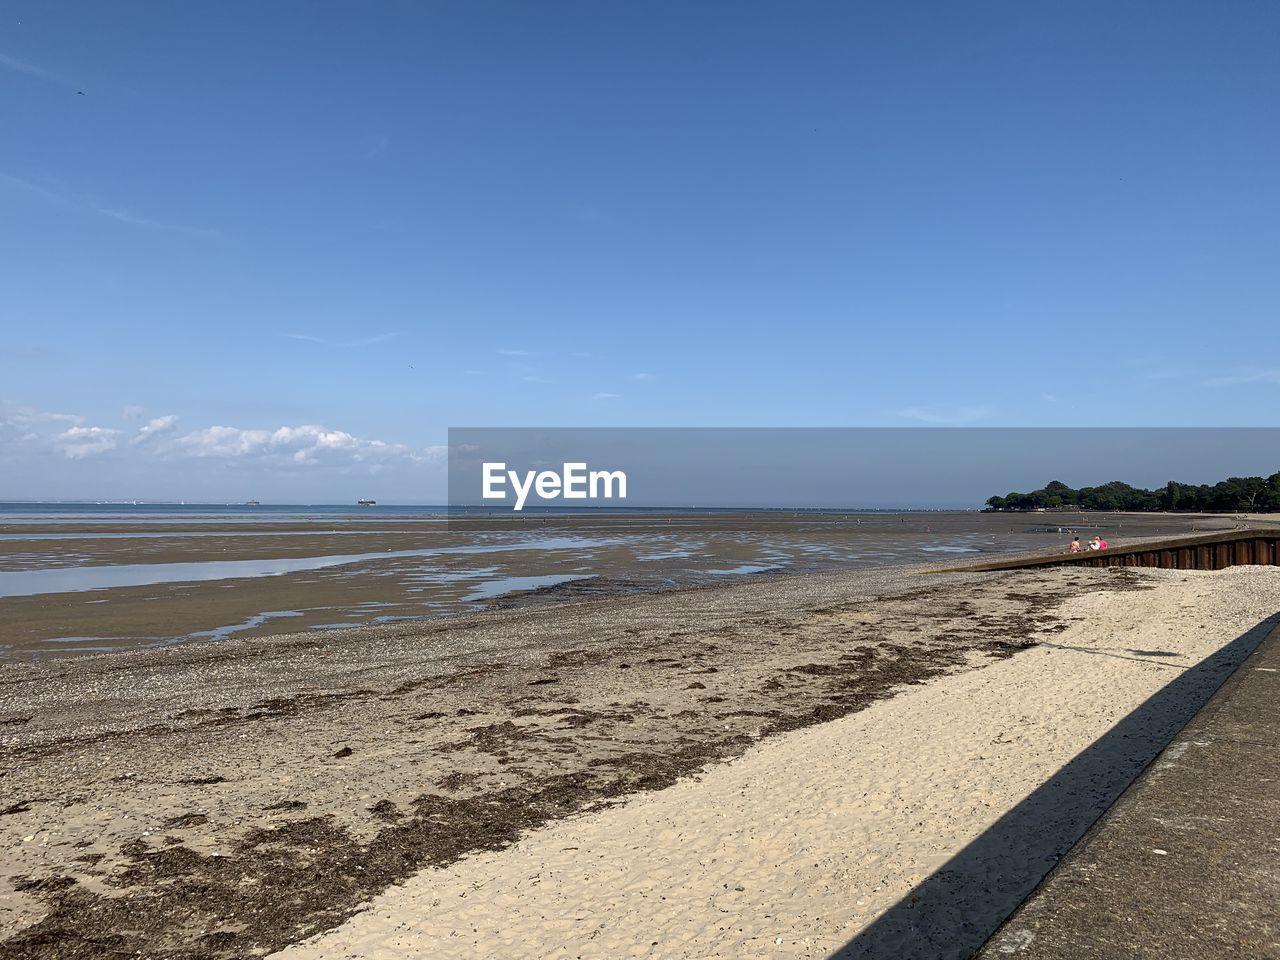 water, sea, sky, beach, land, scenics - nature, beauty in nature, sand, tranquility, horizon, nature, tranquil scene, sunlight, day, horizon over water, idyllic, blue, non-urban scene, cloud - sky, outdoors, no people